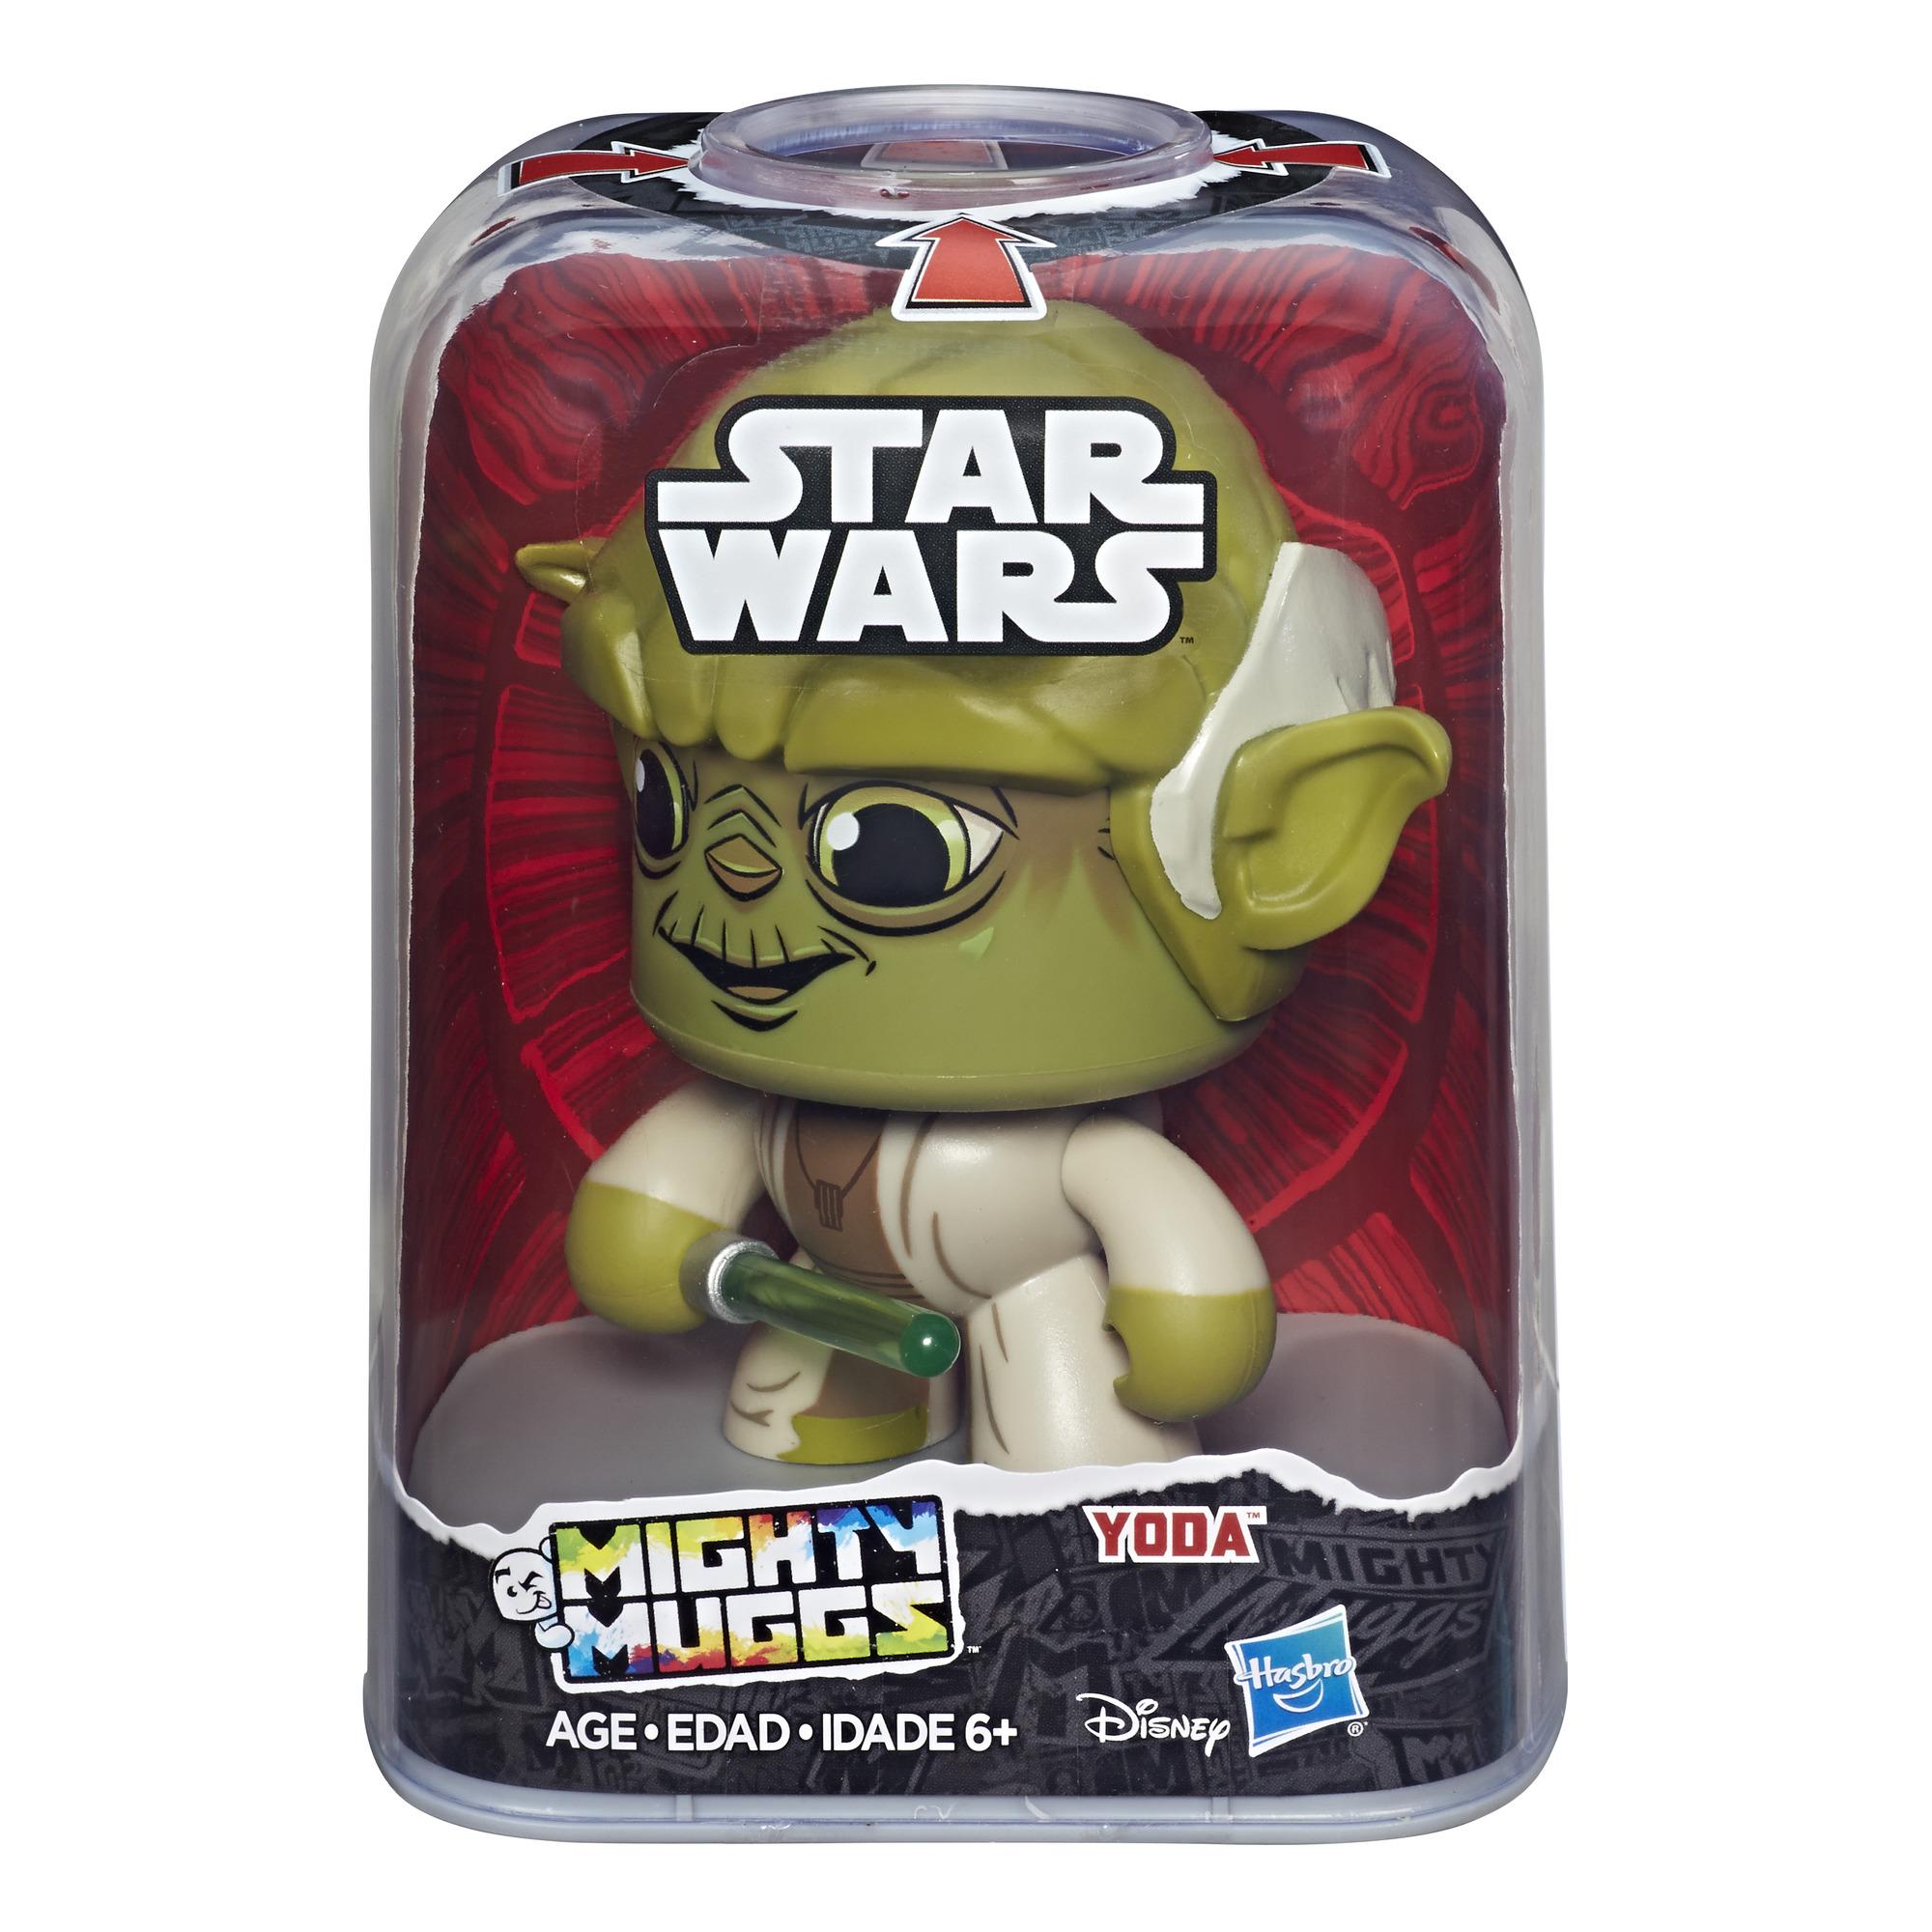 ROTS Master Yoda Mighty Muggs Figure 1